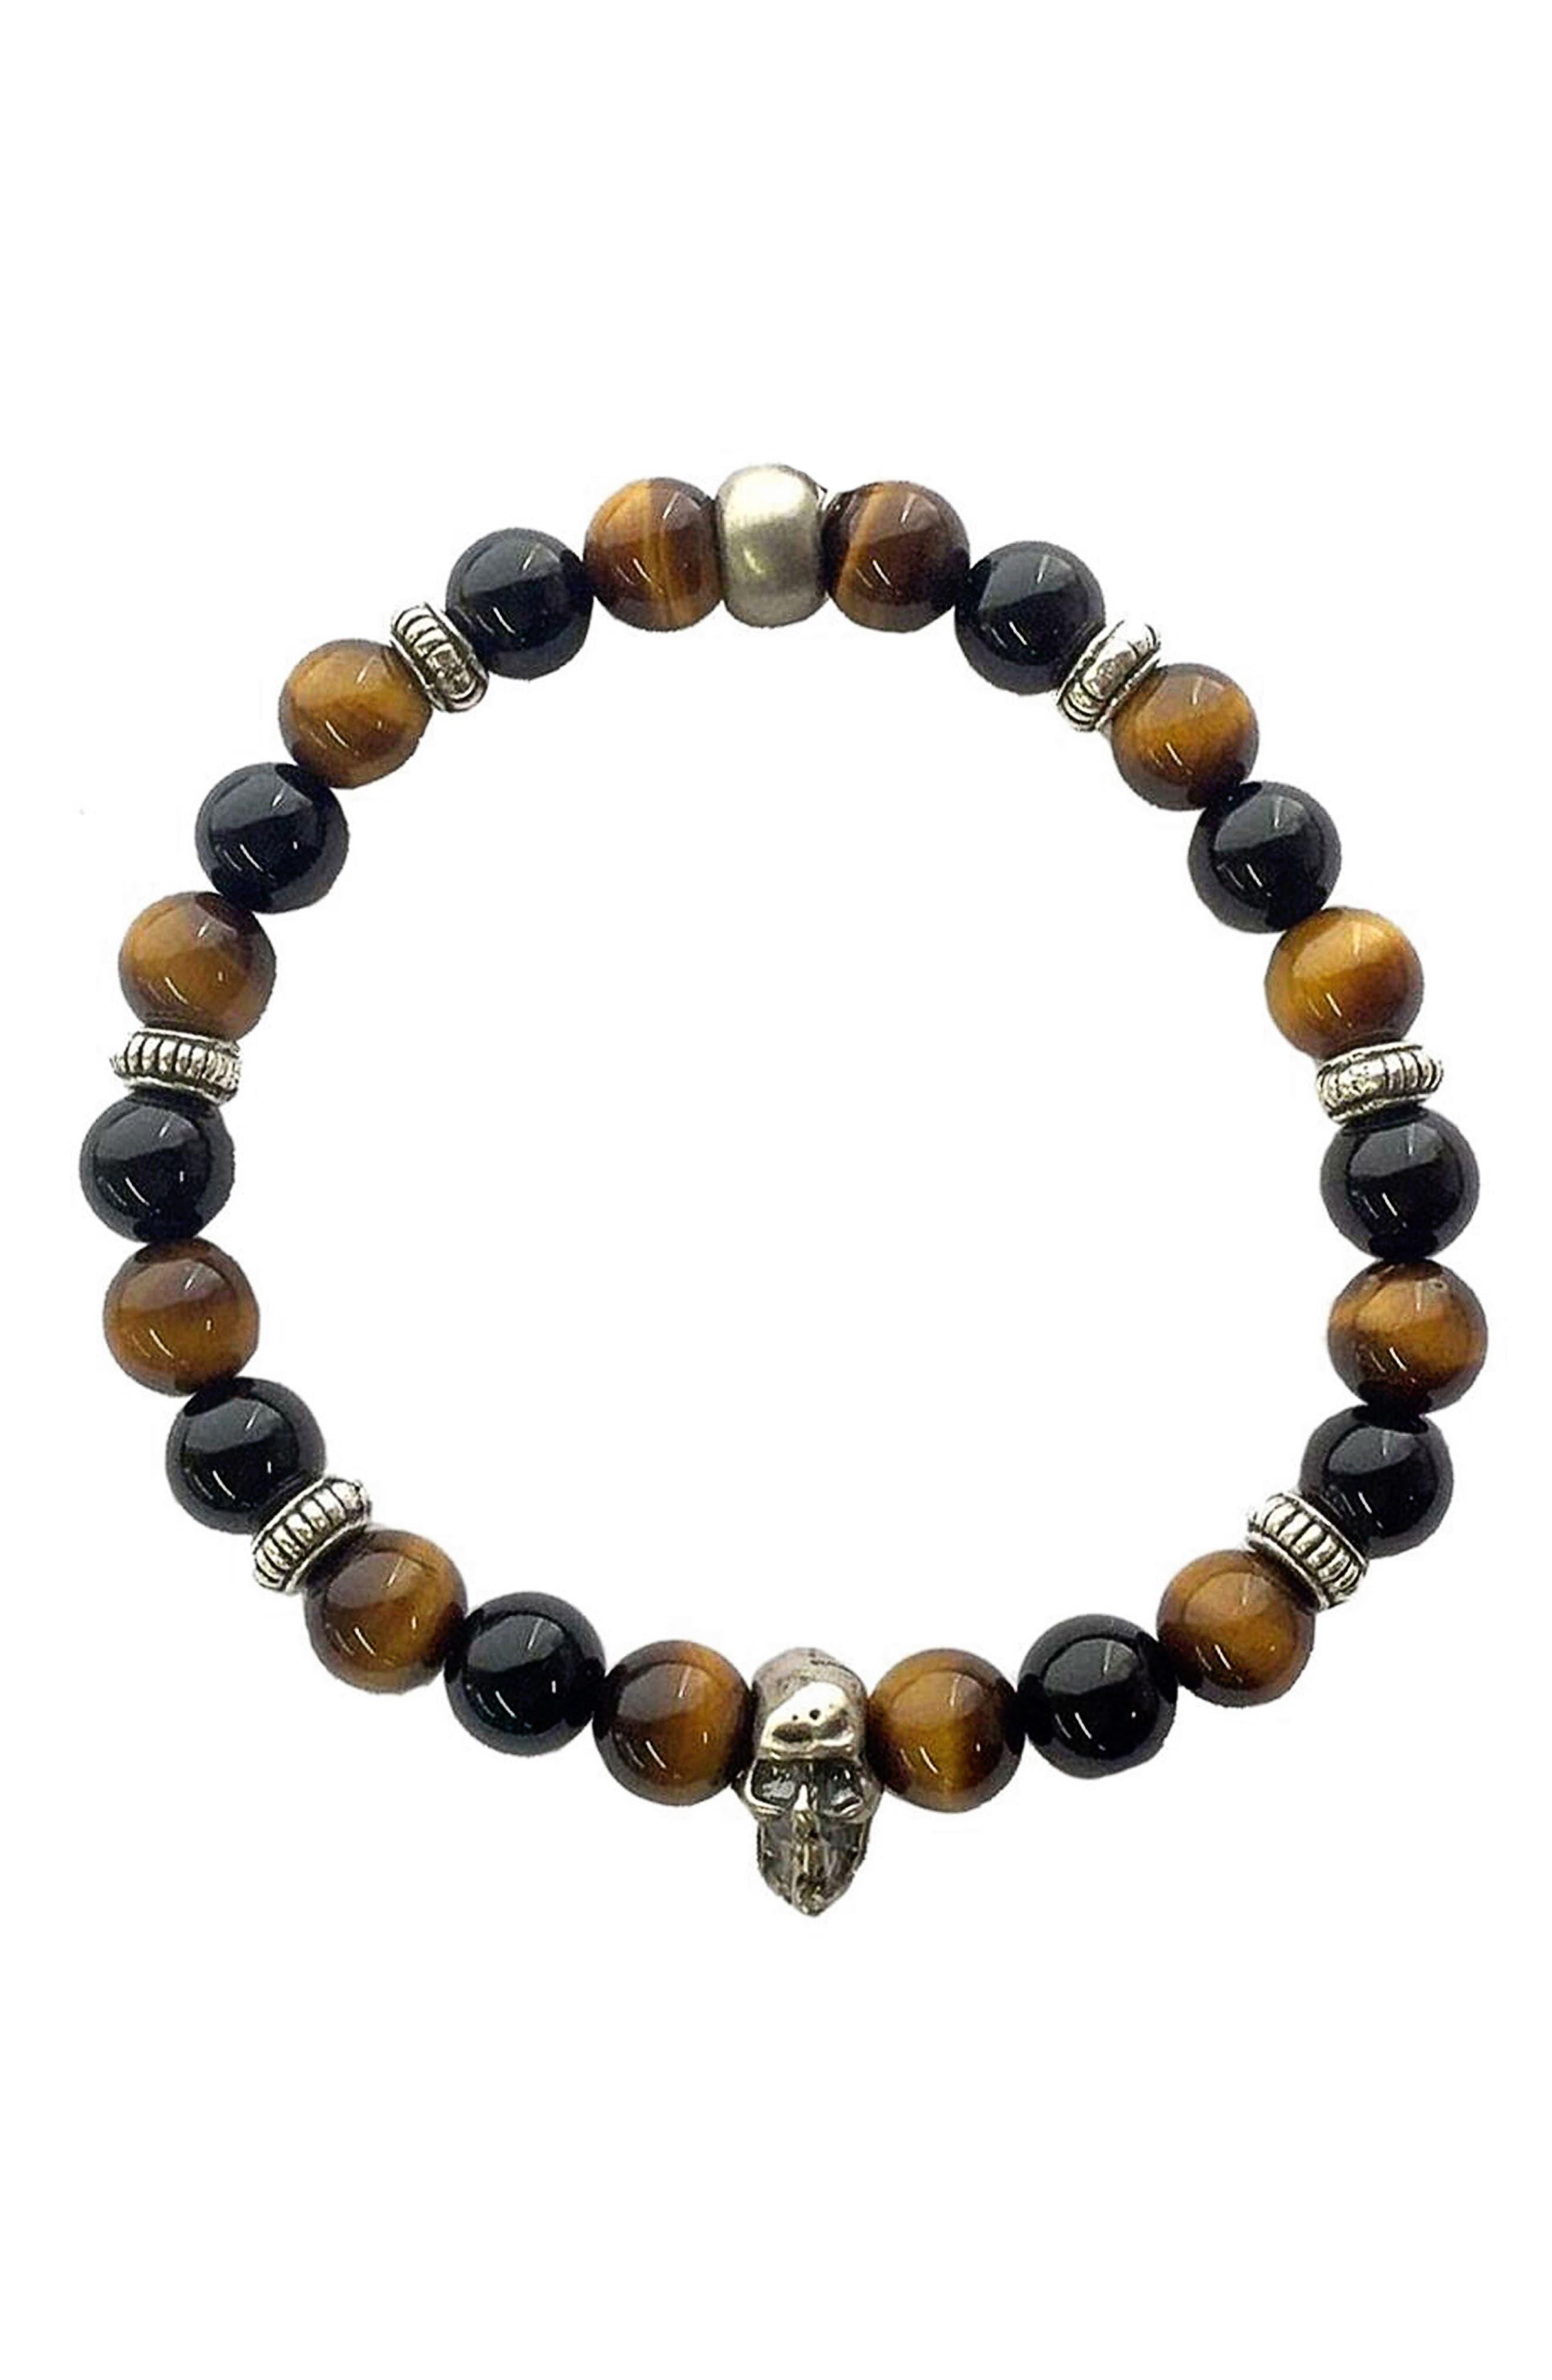 Tiger's-Eye Onyx Stretch Bracelet,                         Main,                         color, Black